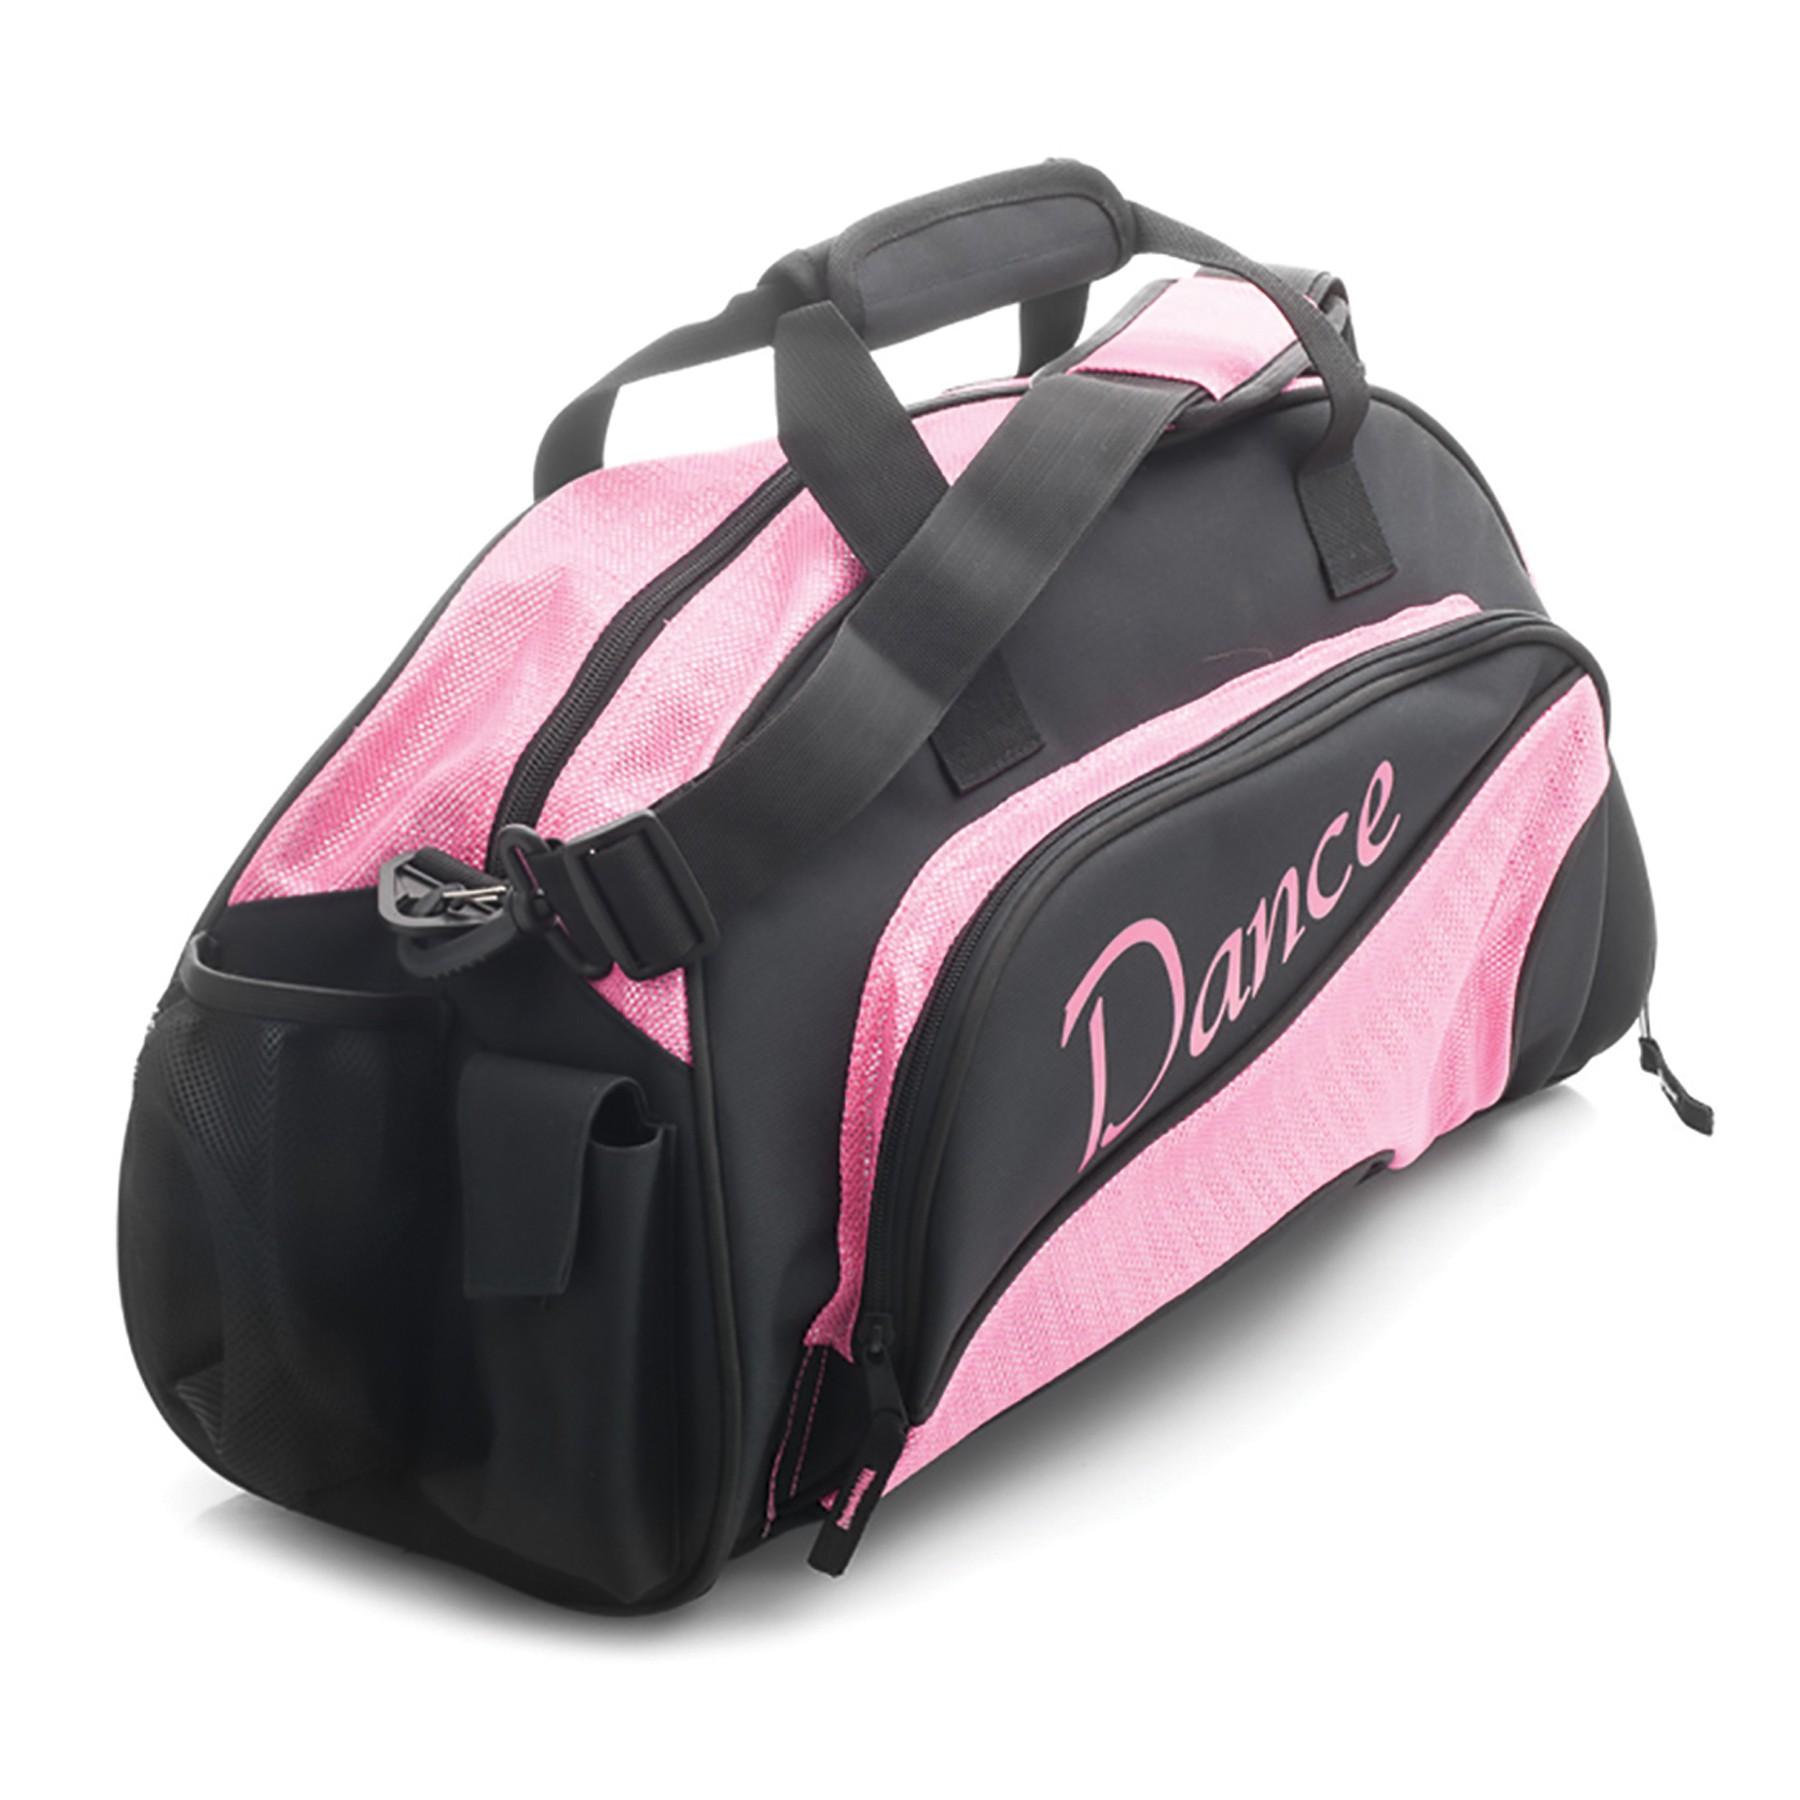 Katz Medium Sports Bag Pink/Black